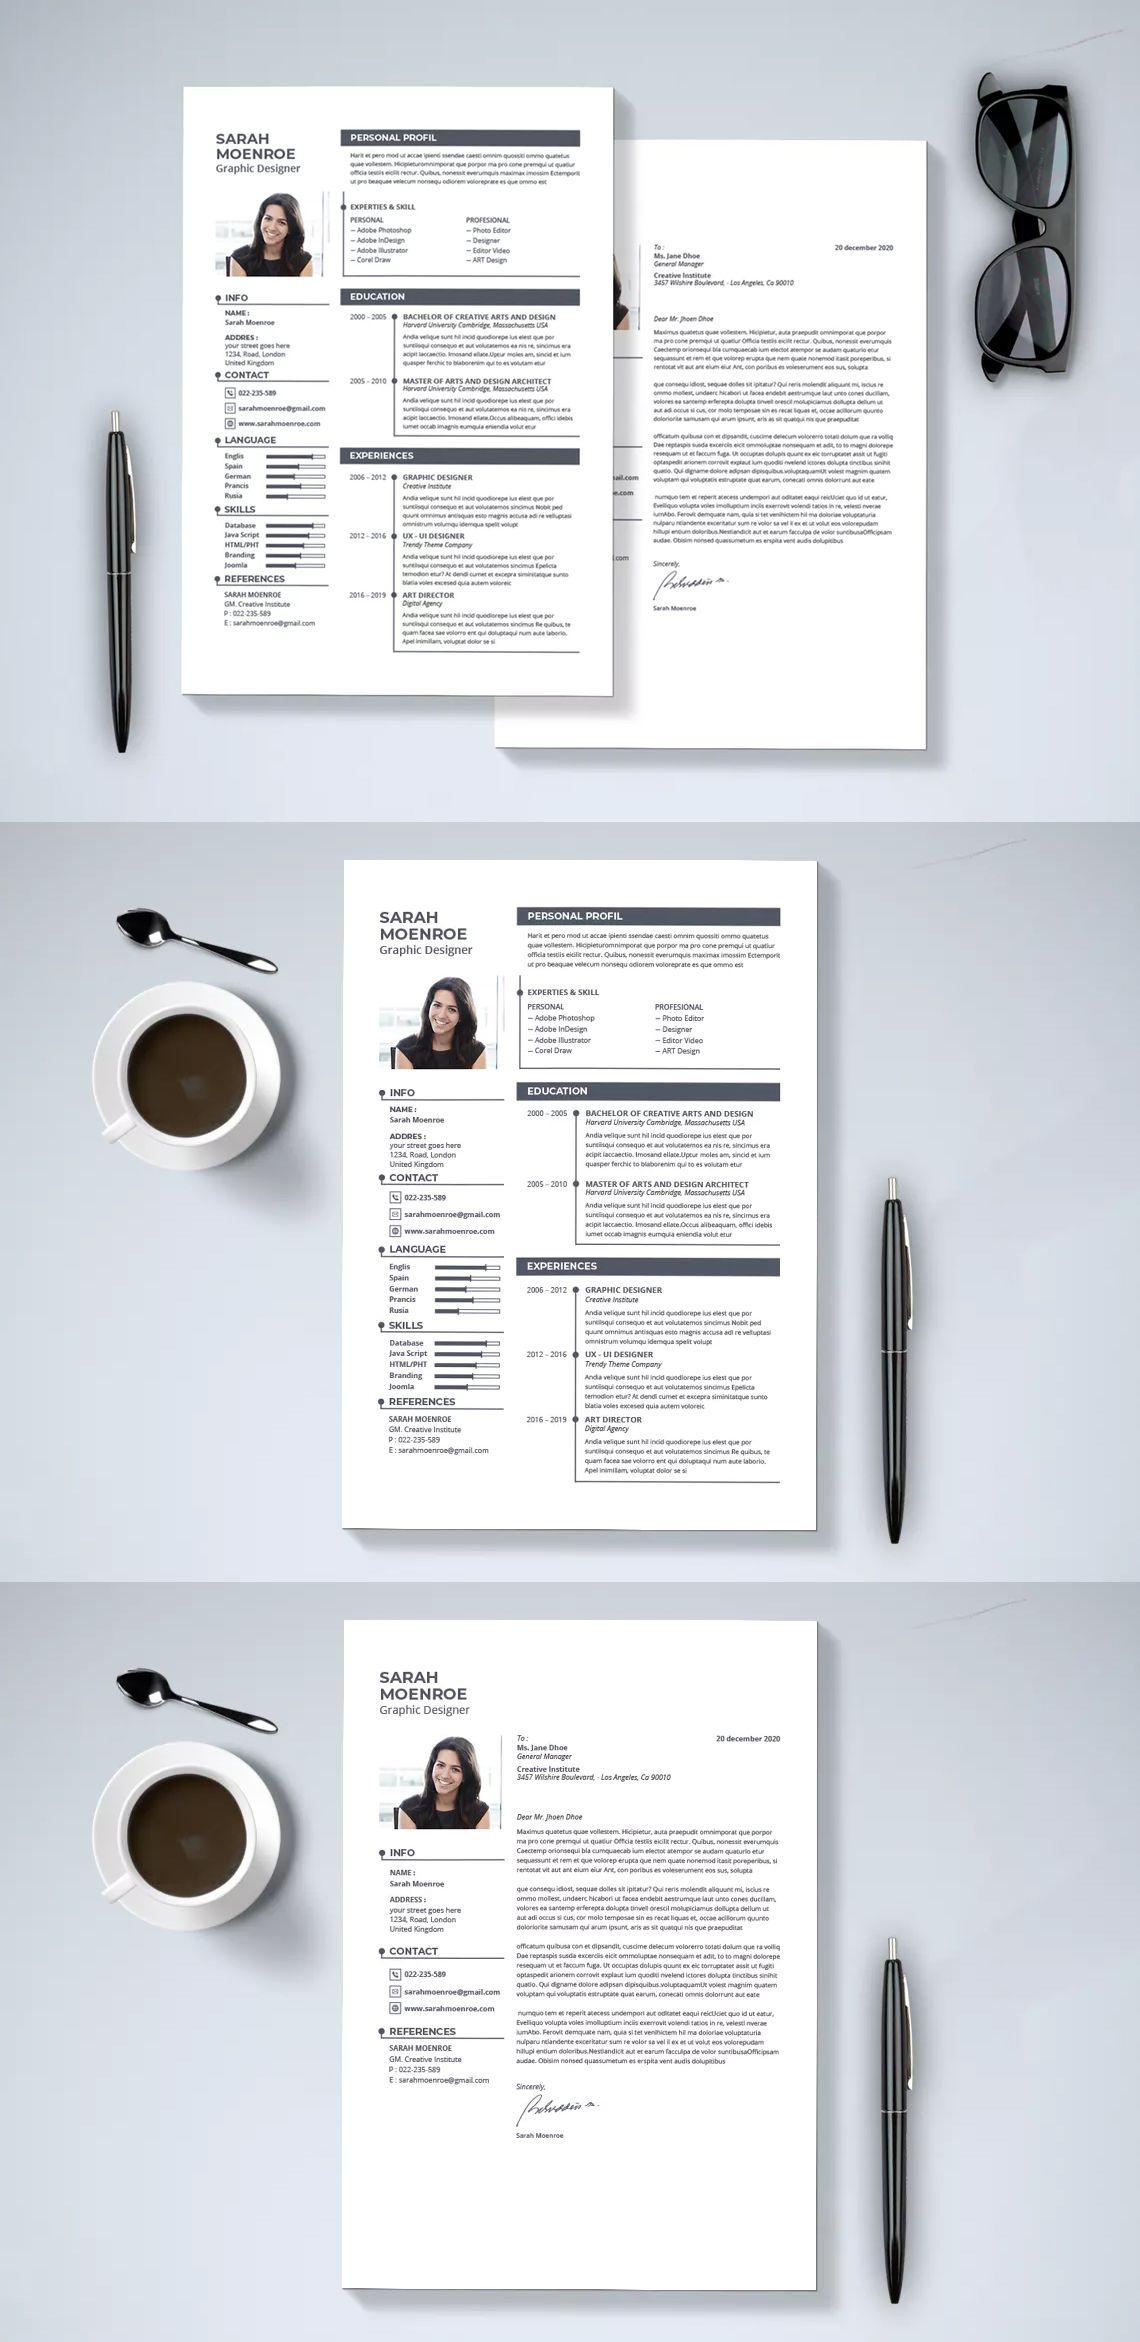 Minimal Resume Cover Letter Template InDesign INDD